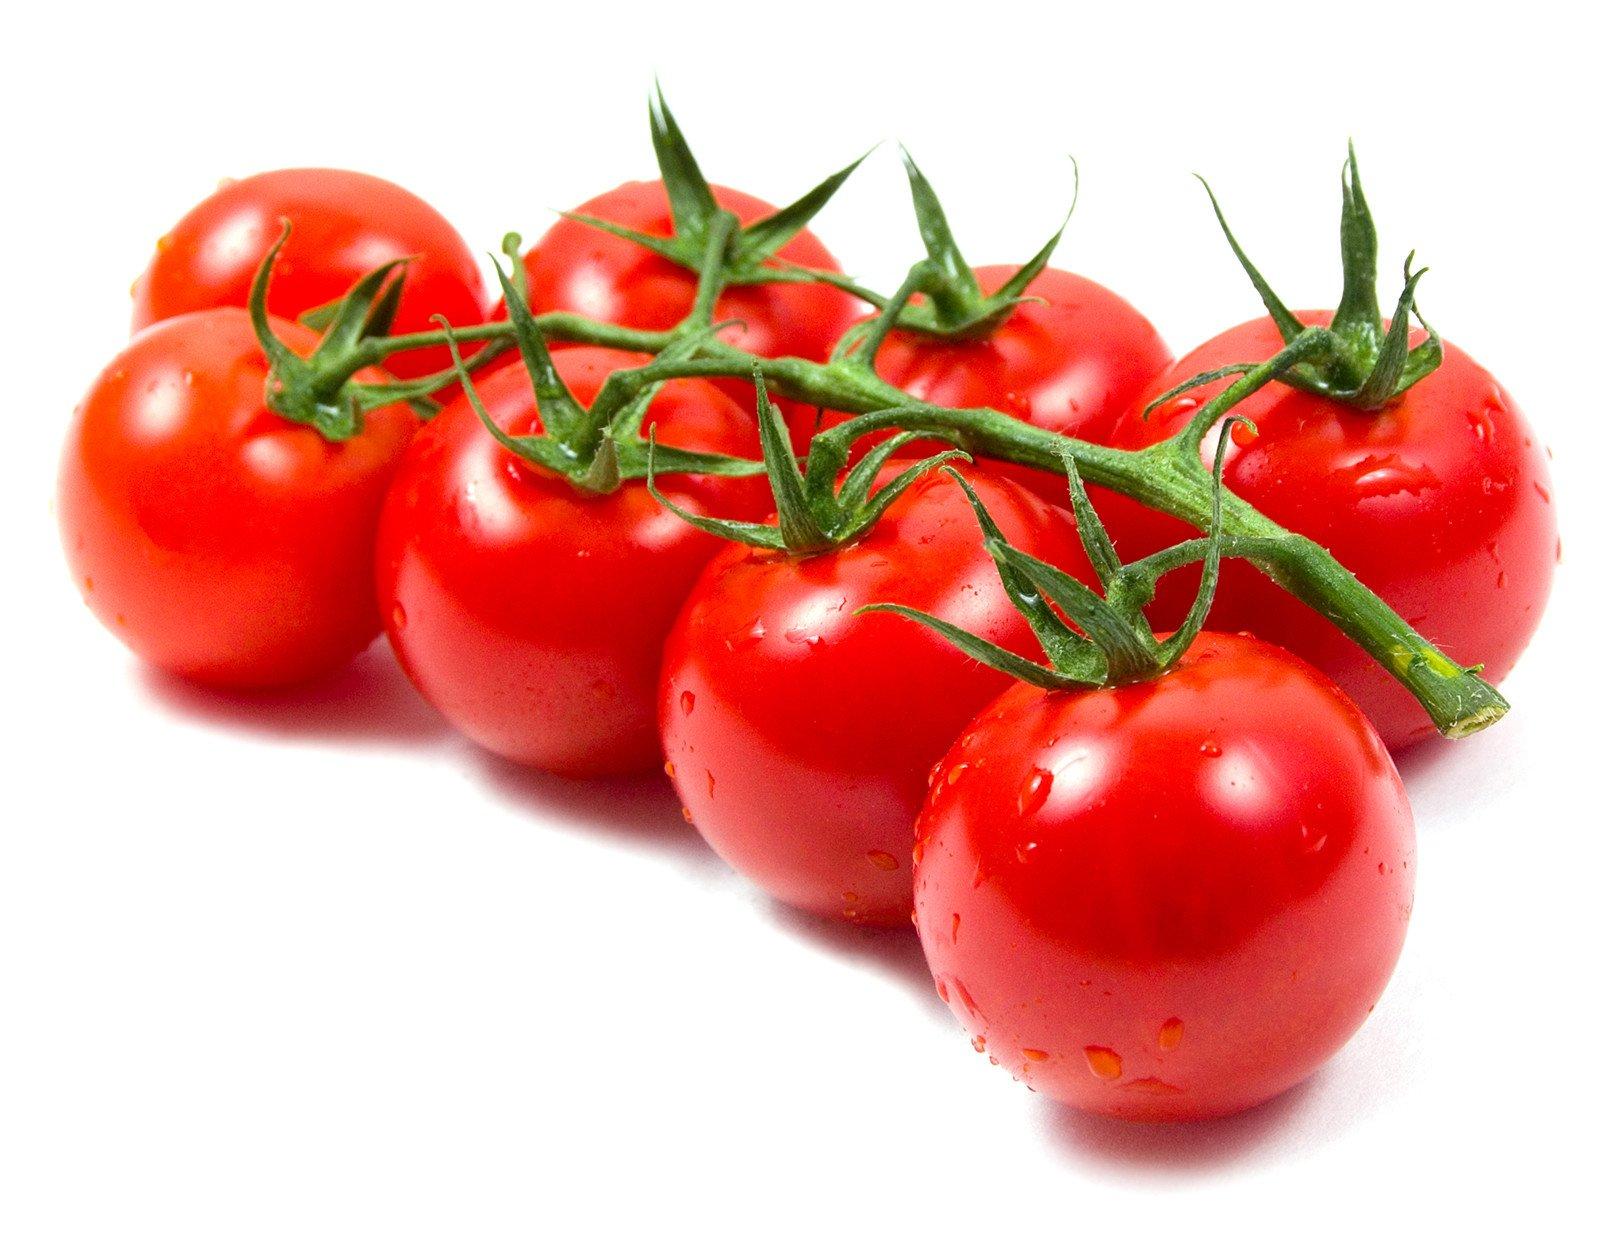 tomato2cherryvine_1590206032.jpg